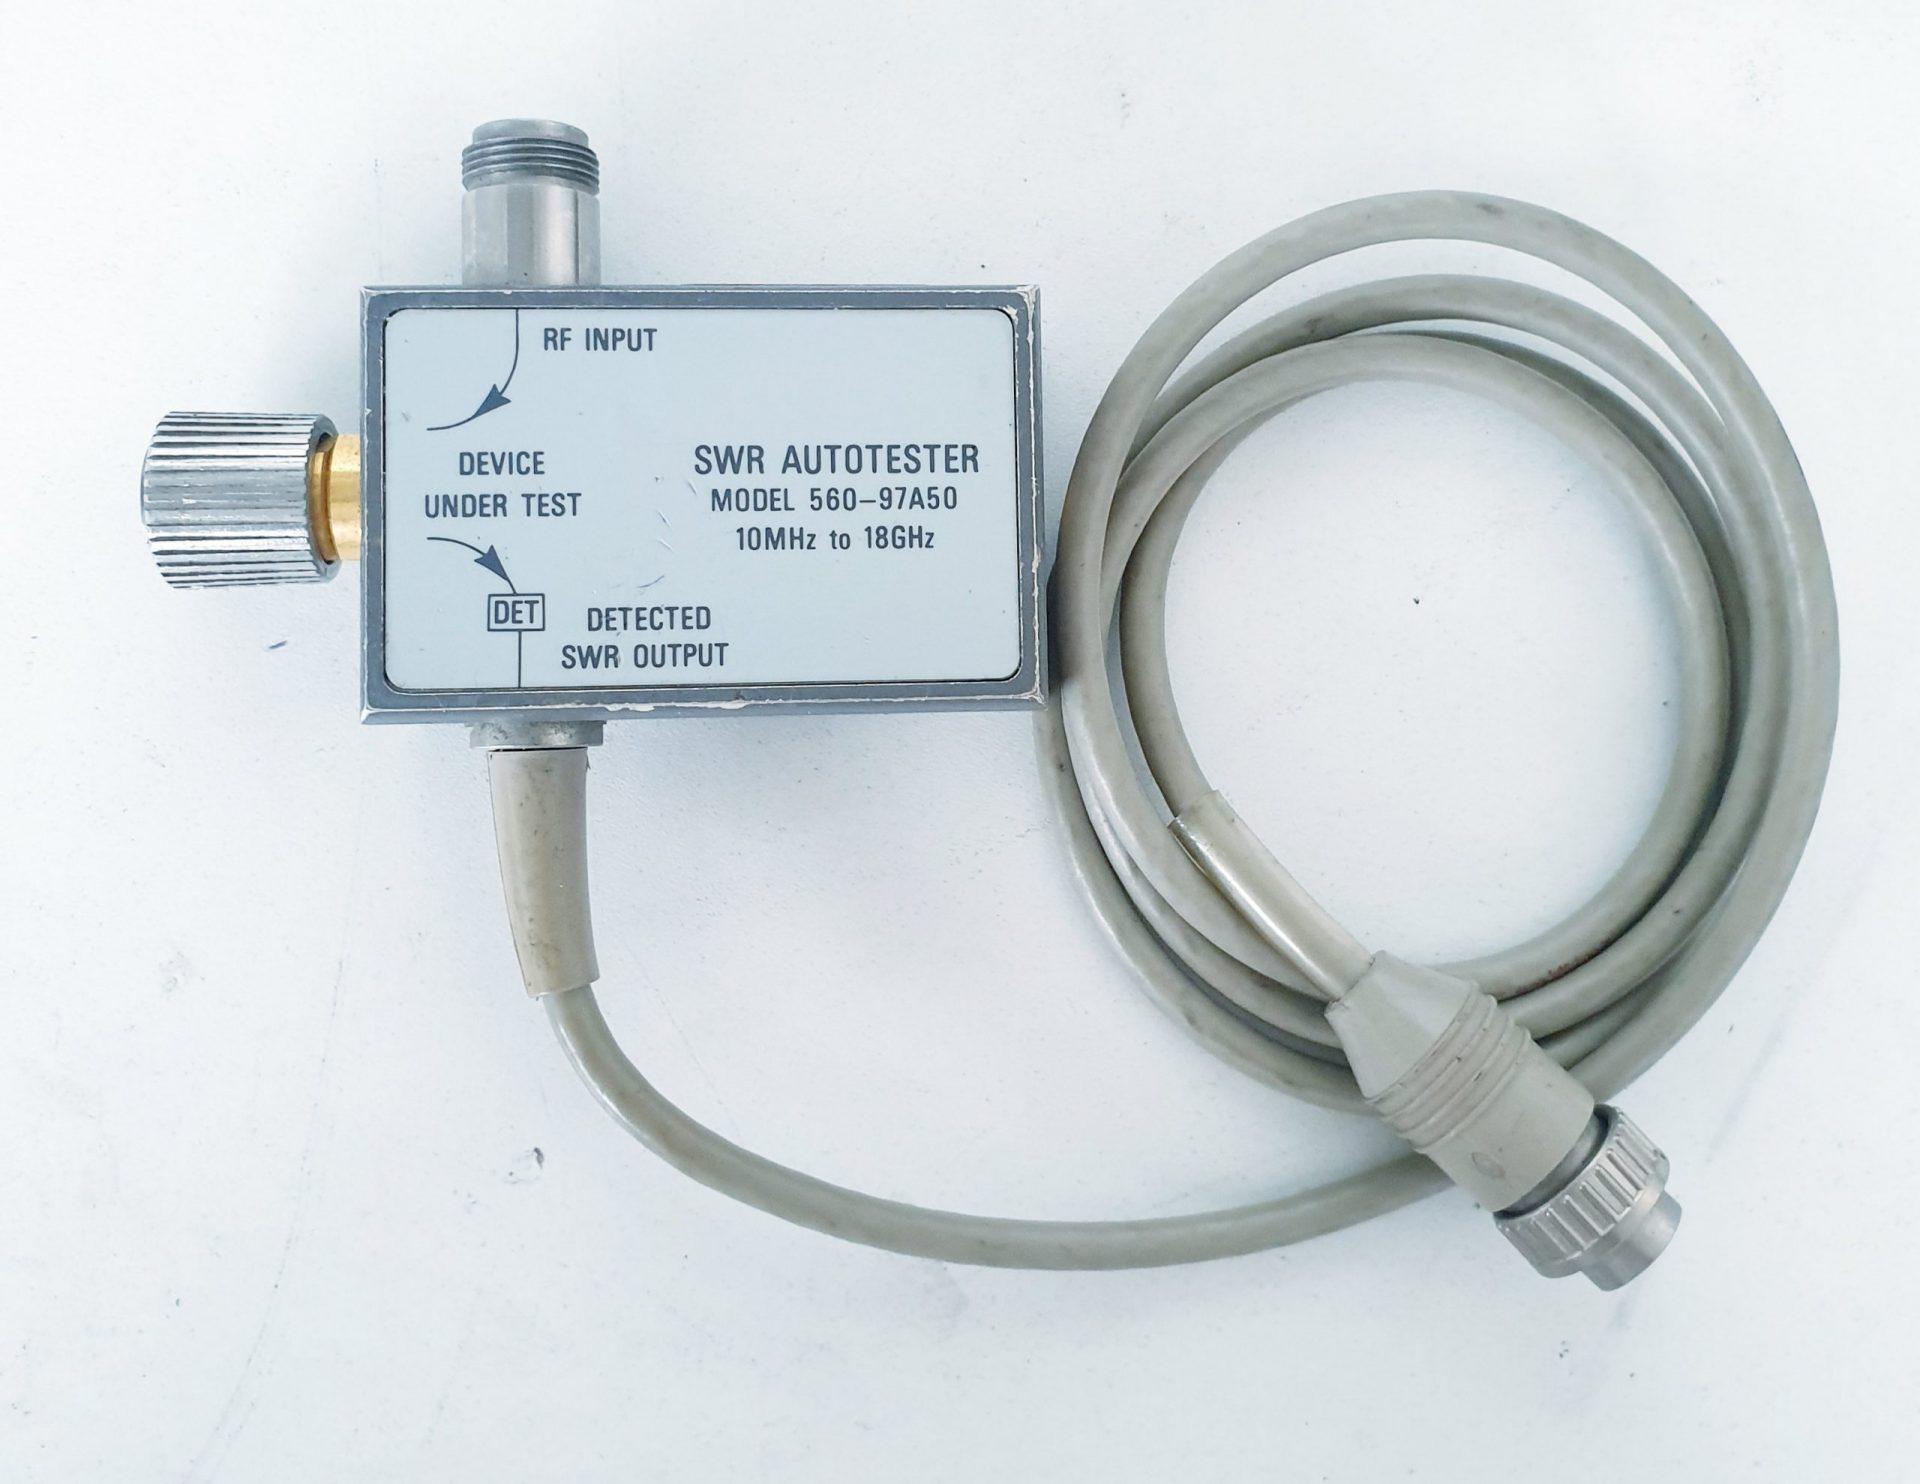 SWR  AUTOTESTER 10MHz - 18GHz - ANRITSU (WILTRON)